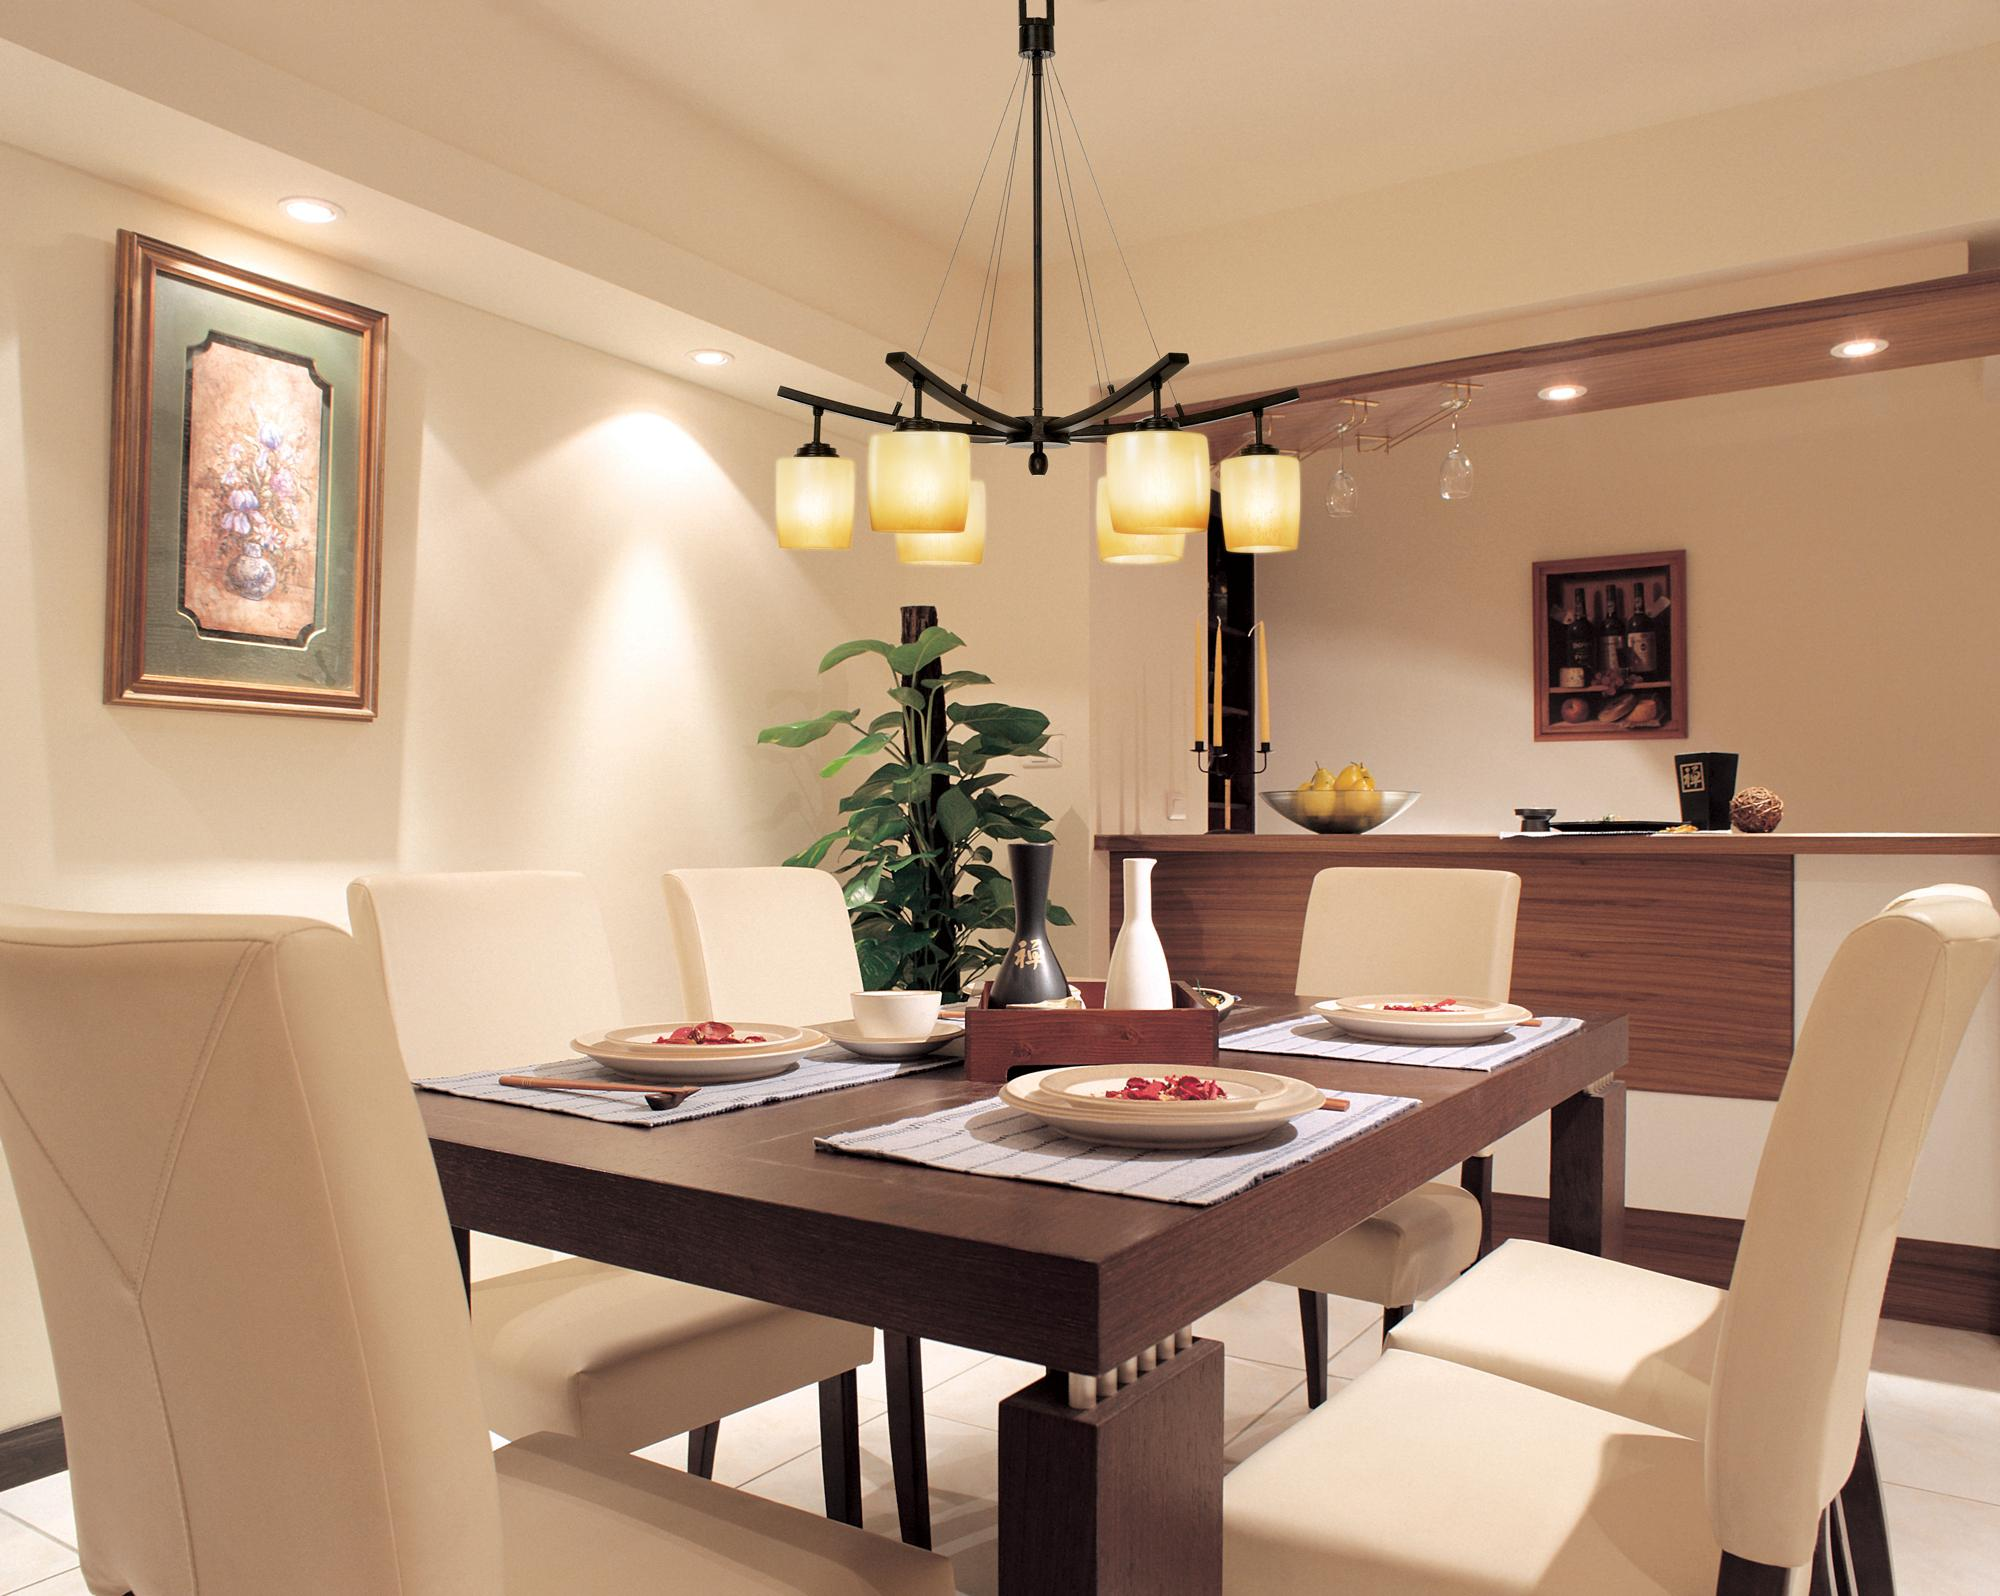 ceiling light kitchen photo - 4